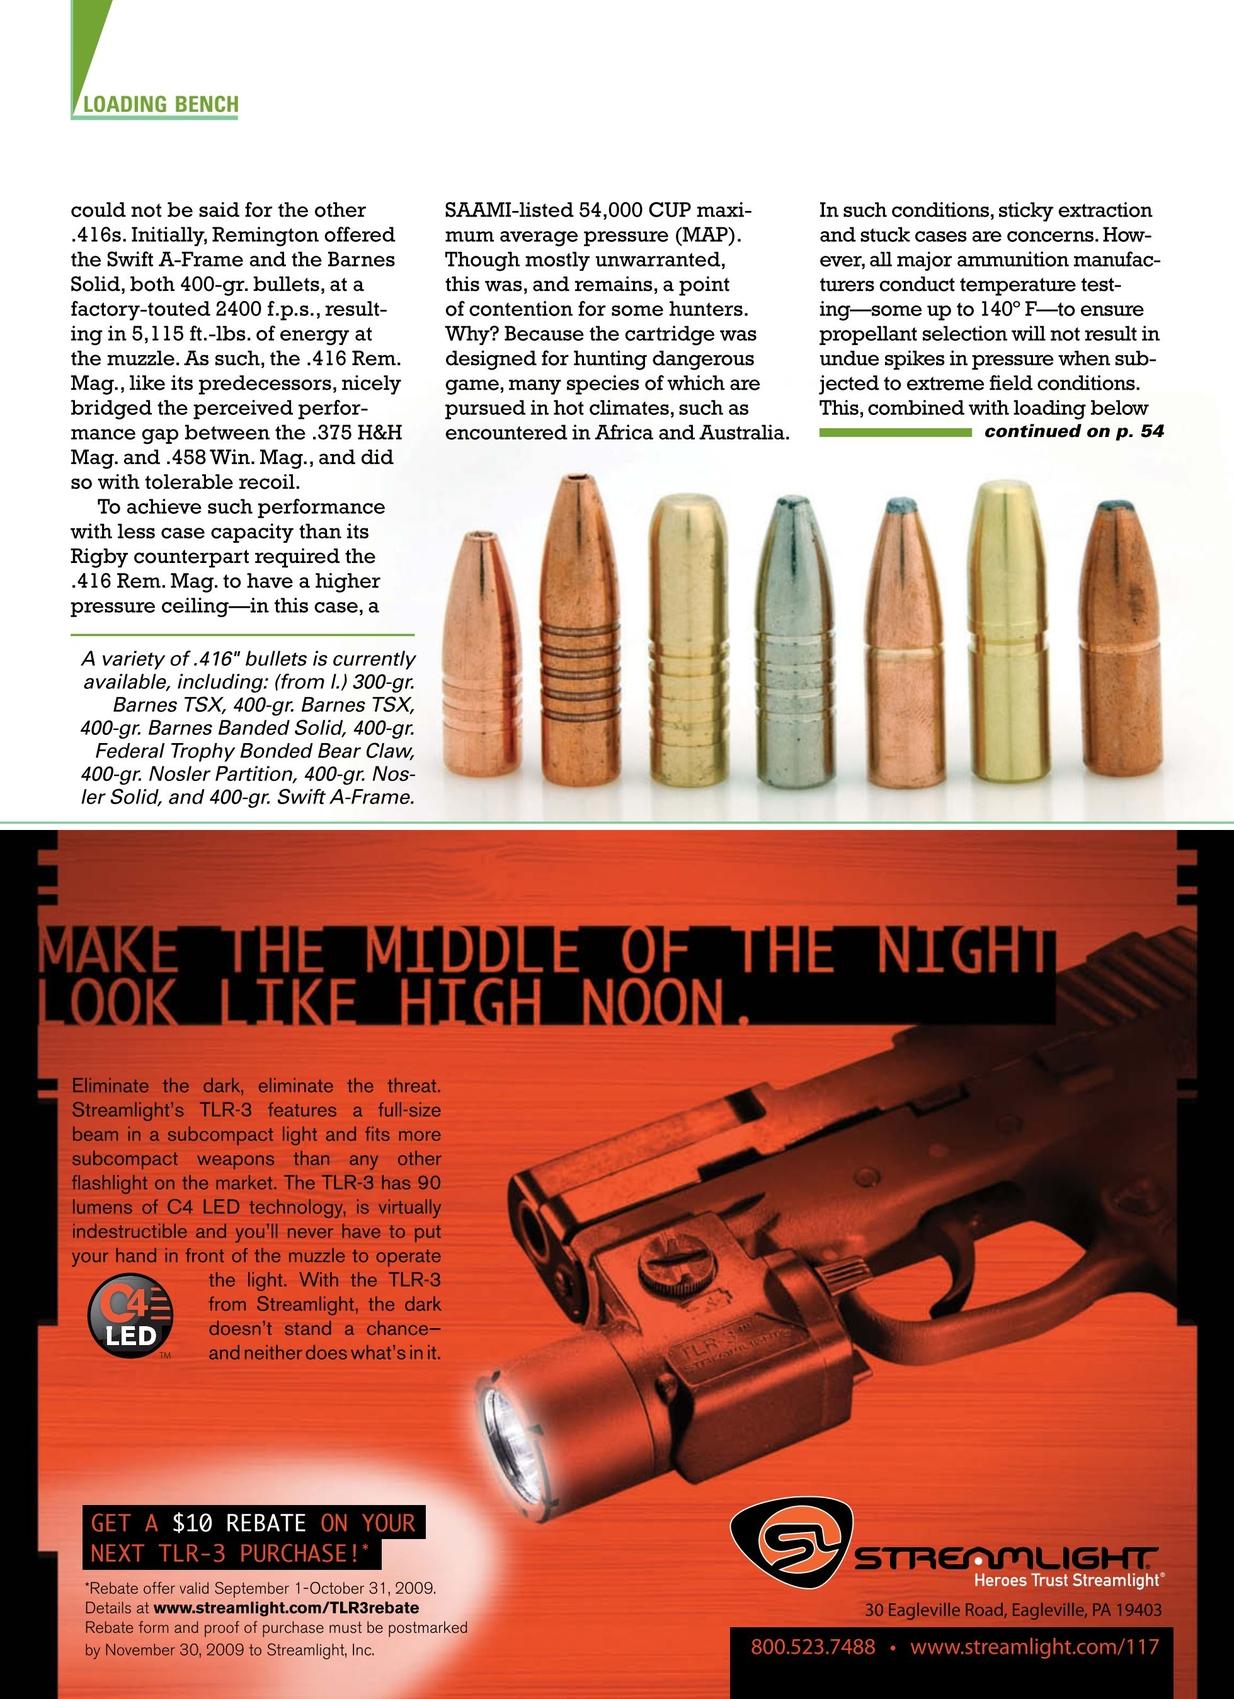 American Rifleman - October 2009